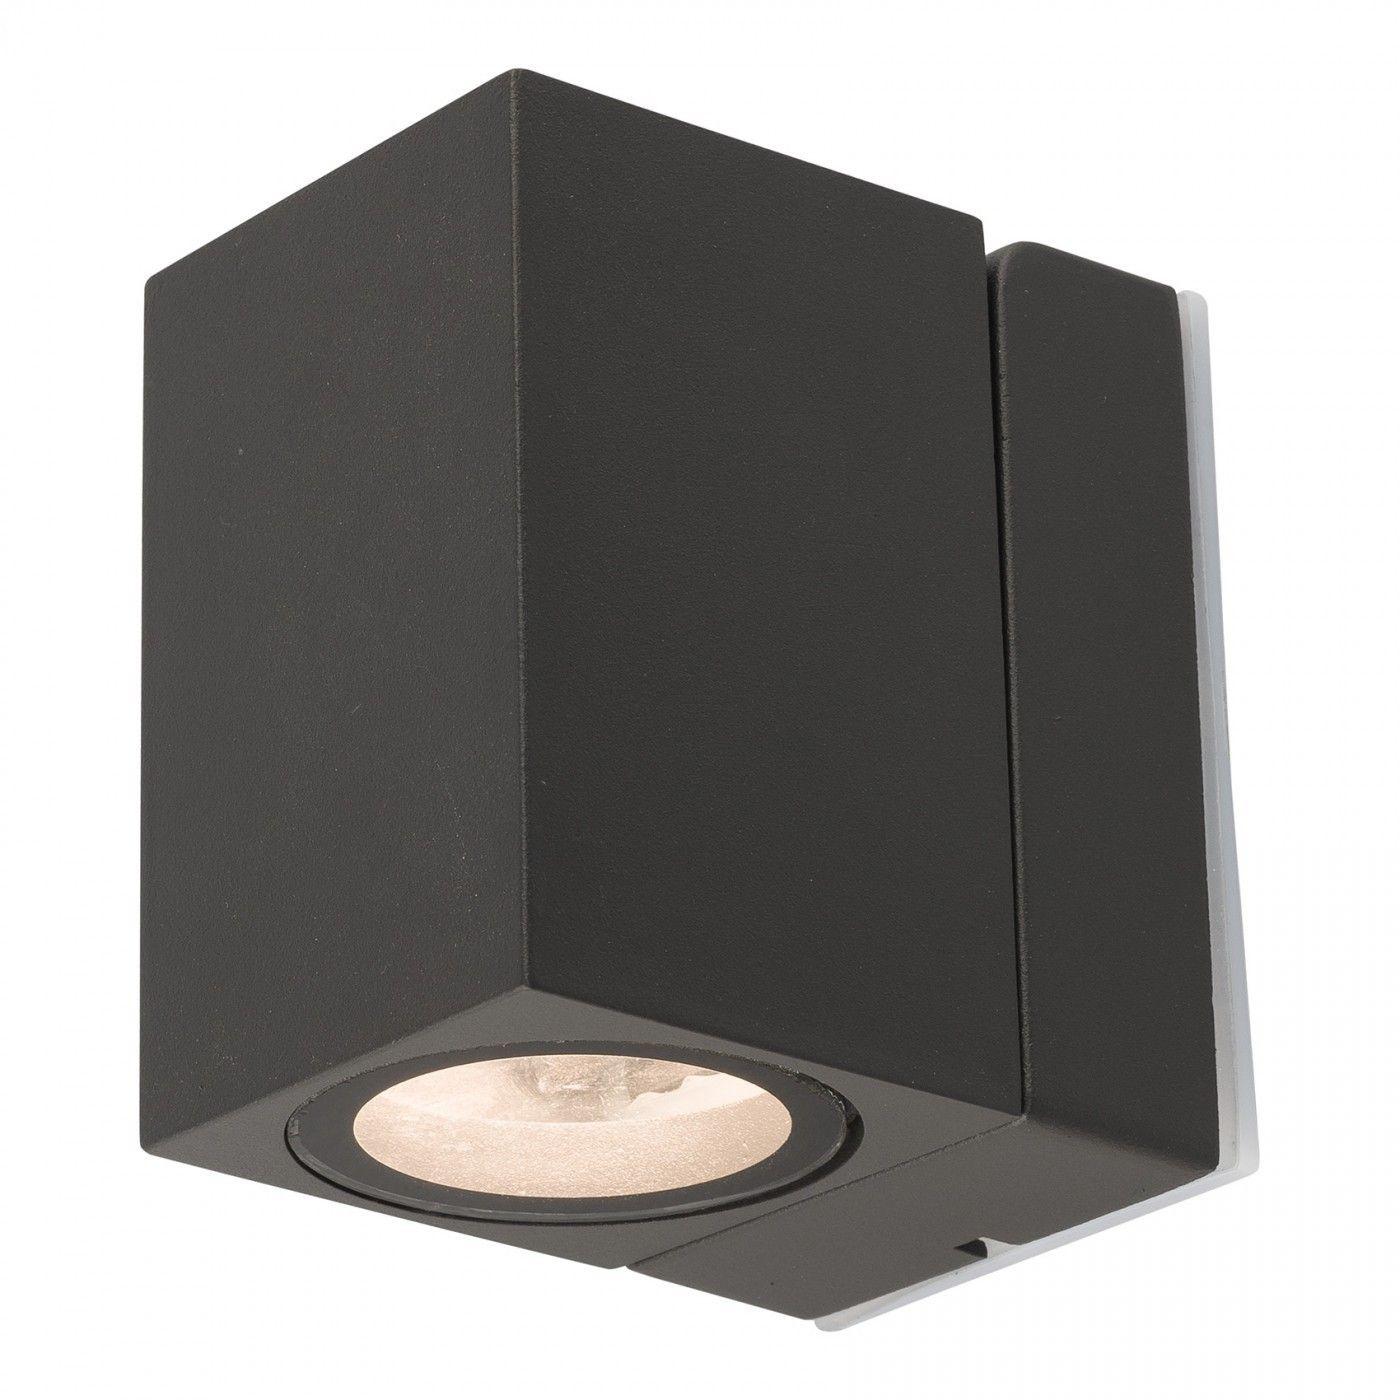 Primm Graphite 9551 Nowodvorski Kinkiet Ogrodowy 9551 Abanet Lighting Lamp Decor